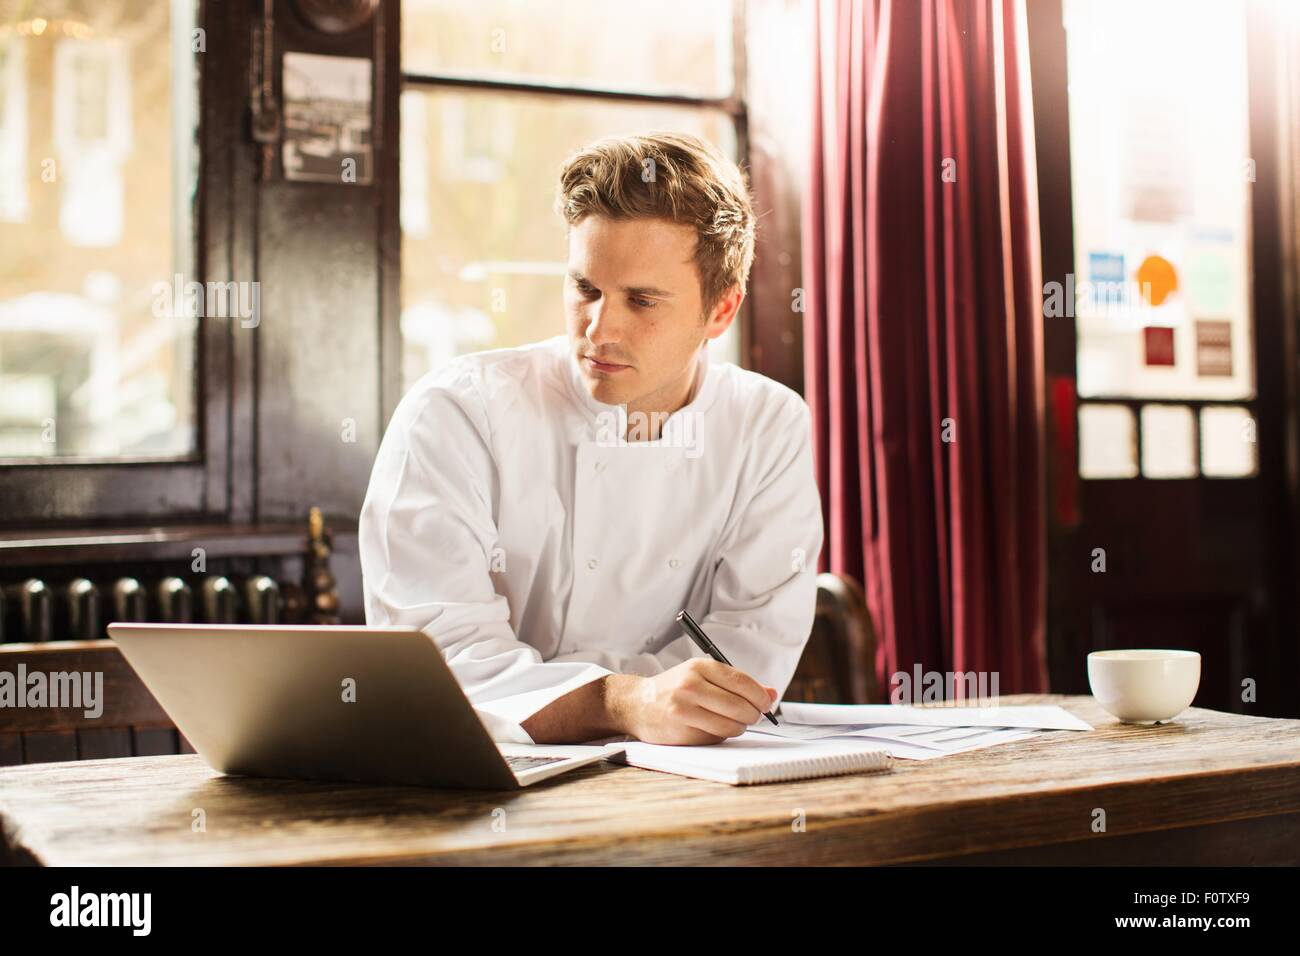 Jeune homme portant uniforme chef using laptop Photo Stock